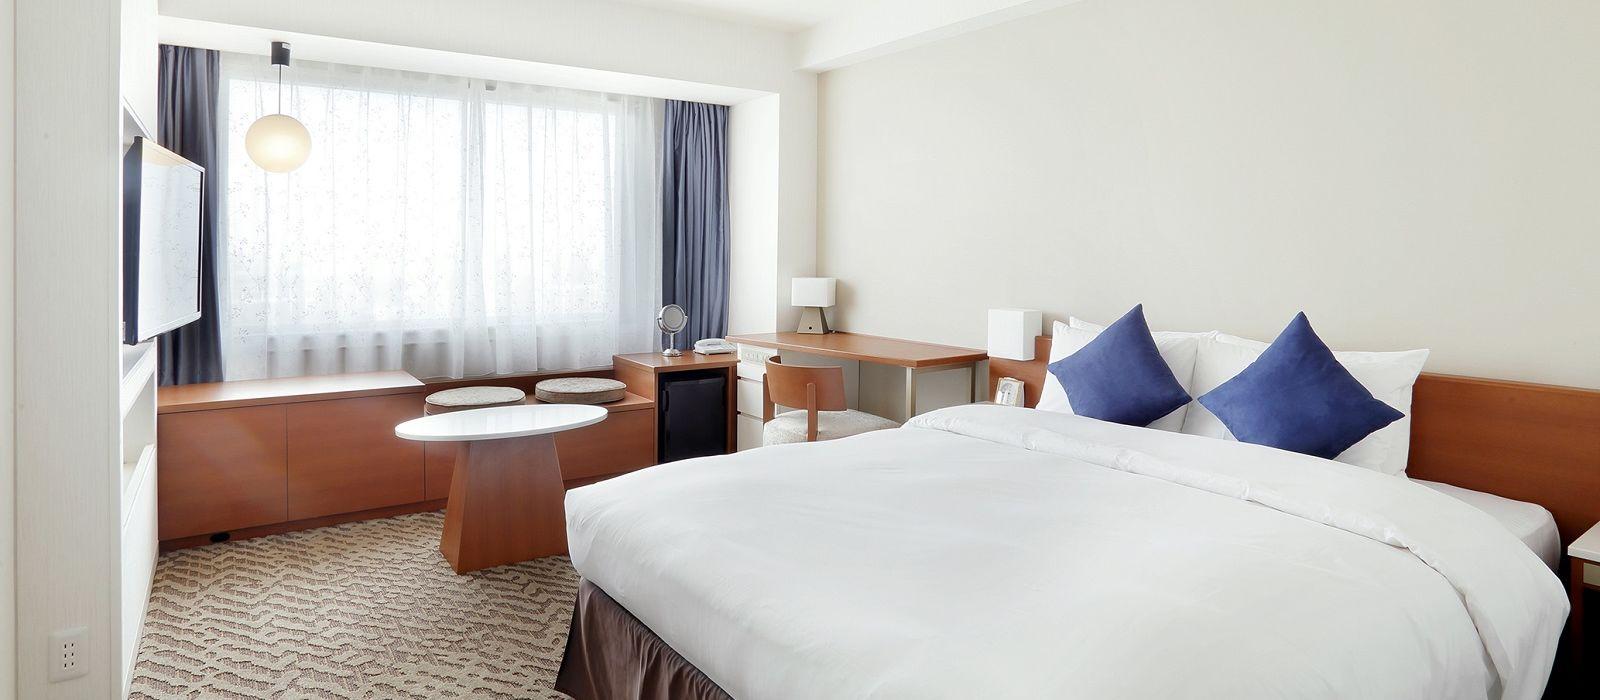 Hotel Keio Plaza  Sapporo Japan